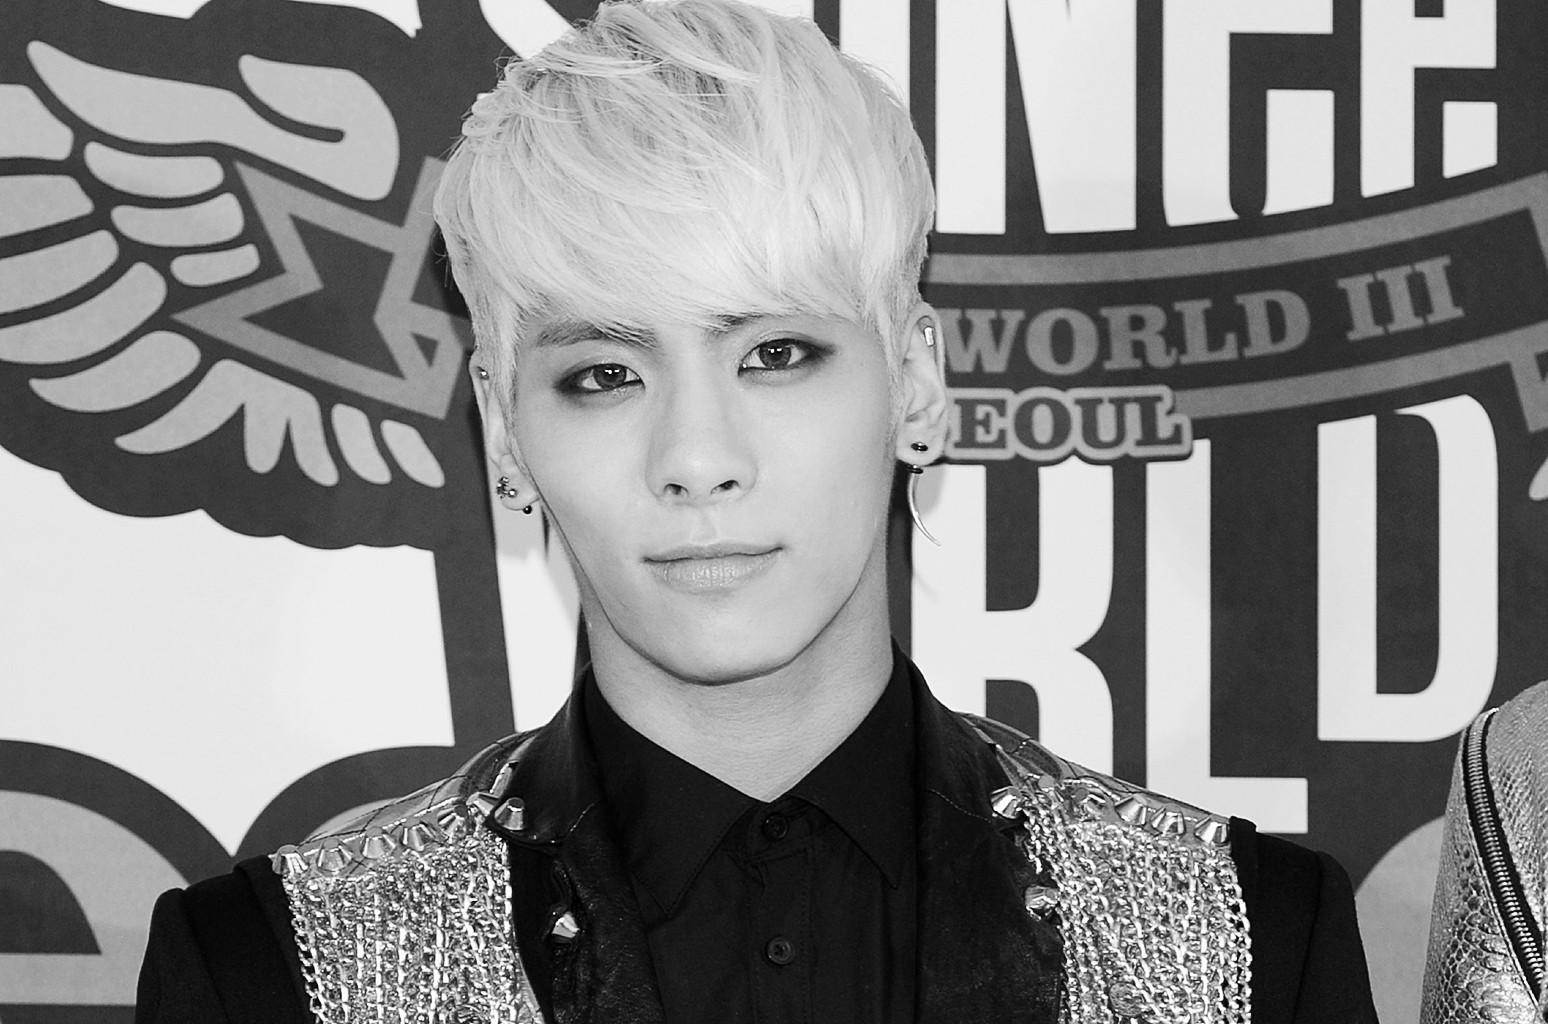 Jonghyun of SHINee